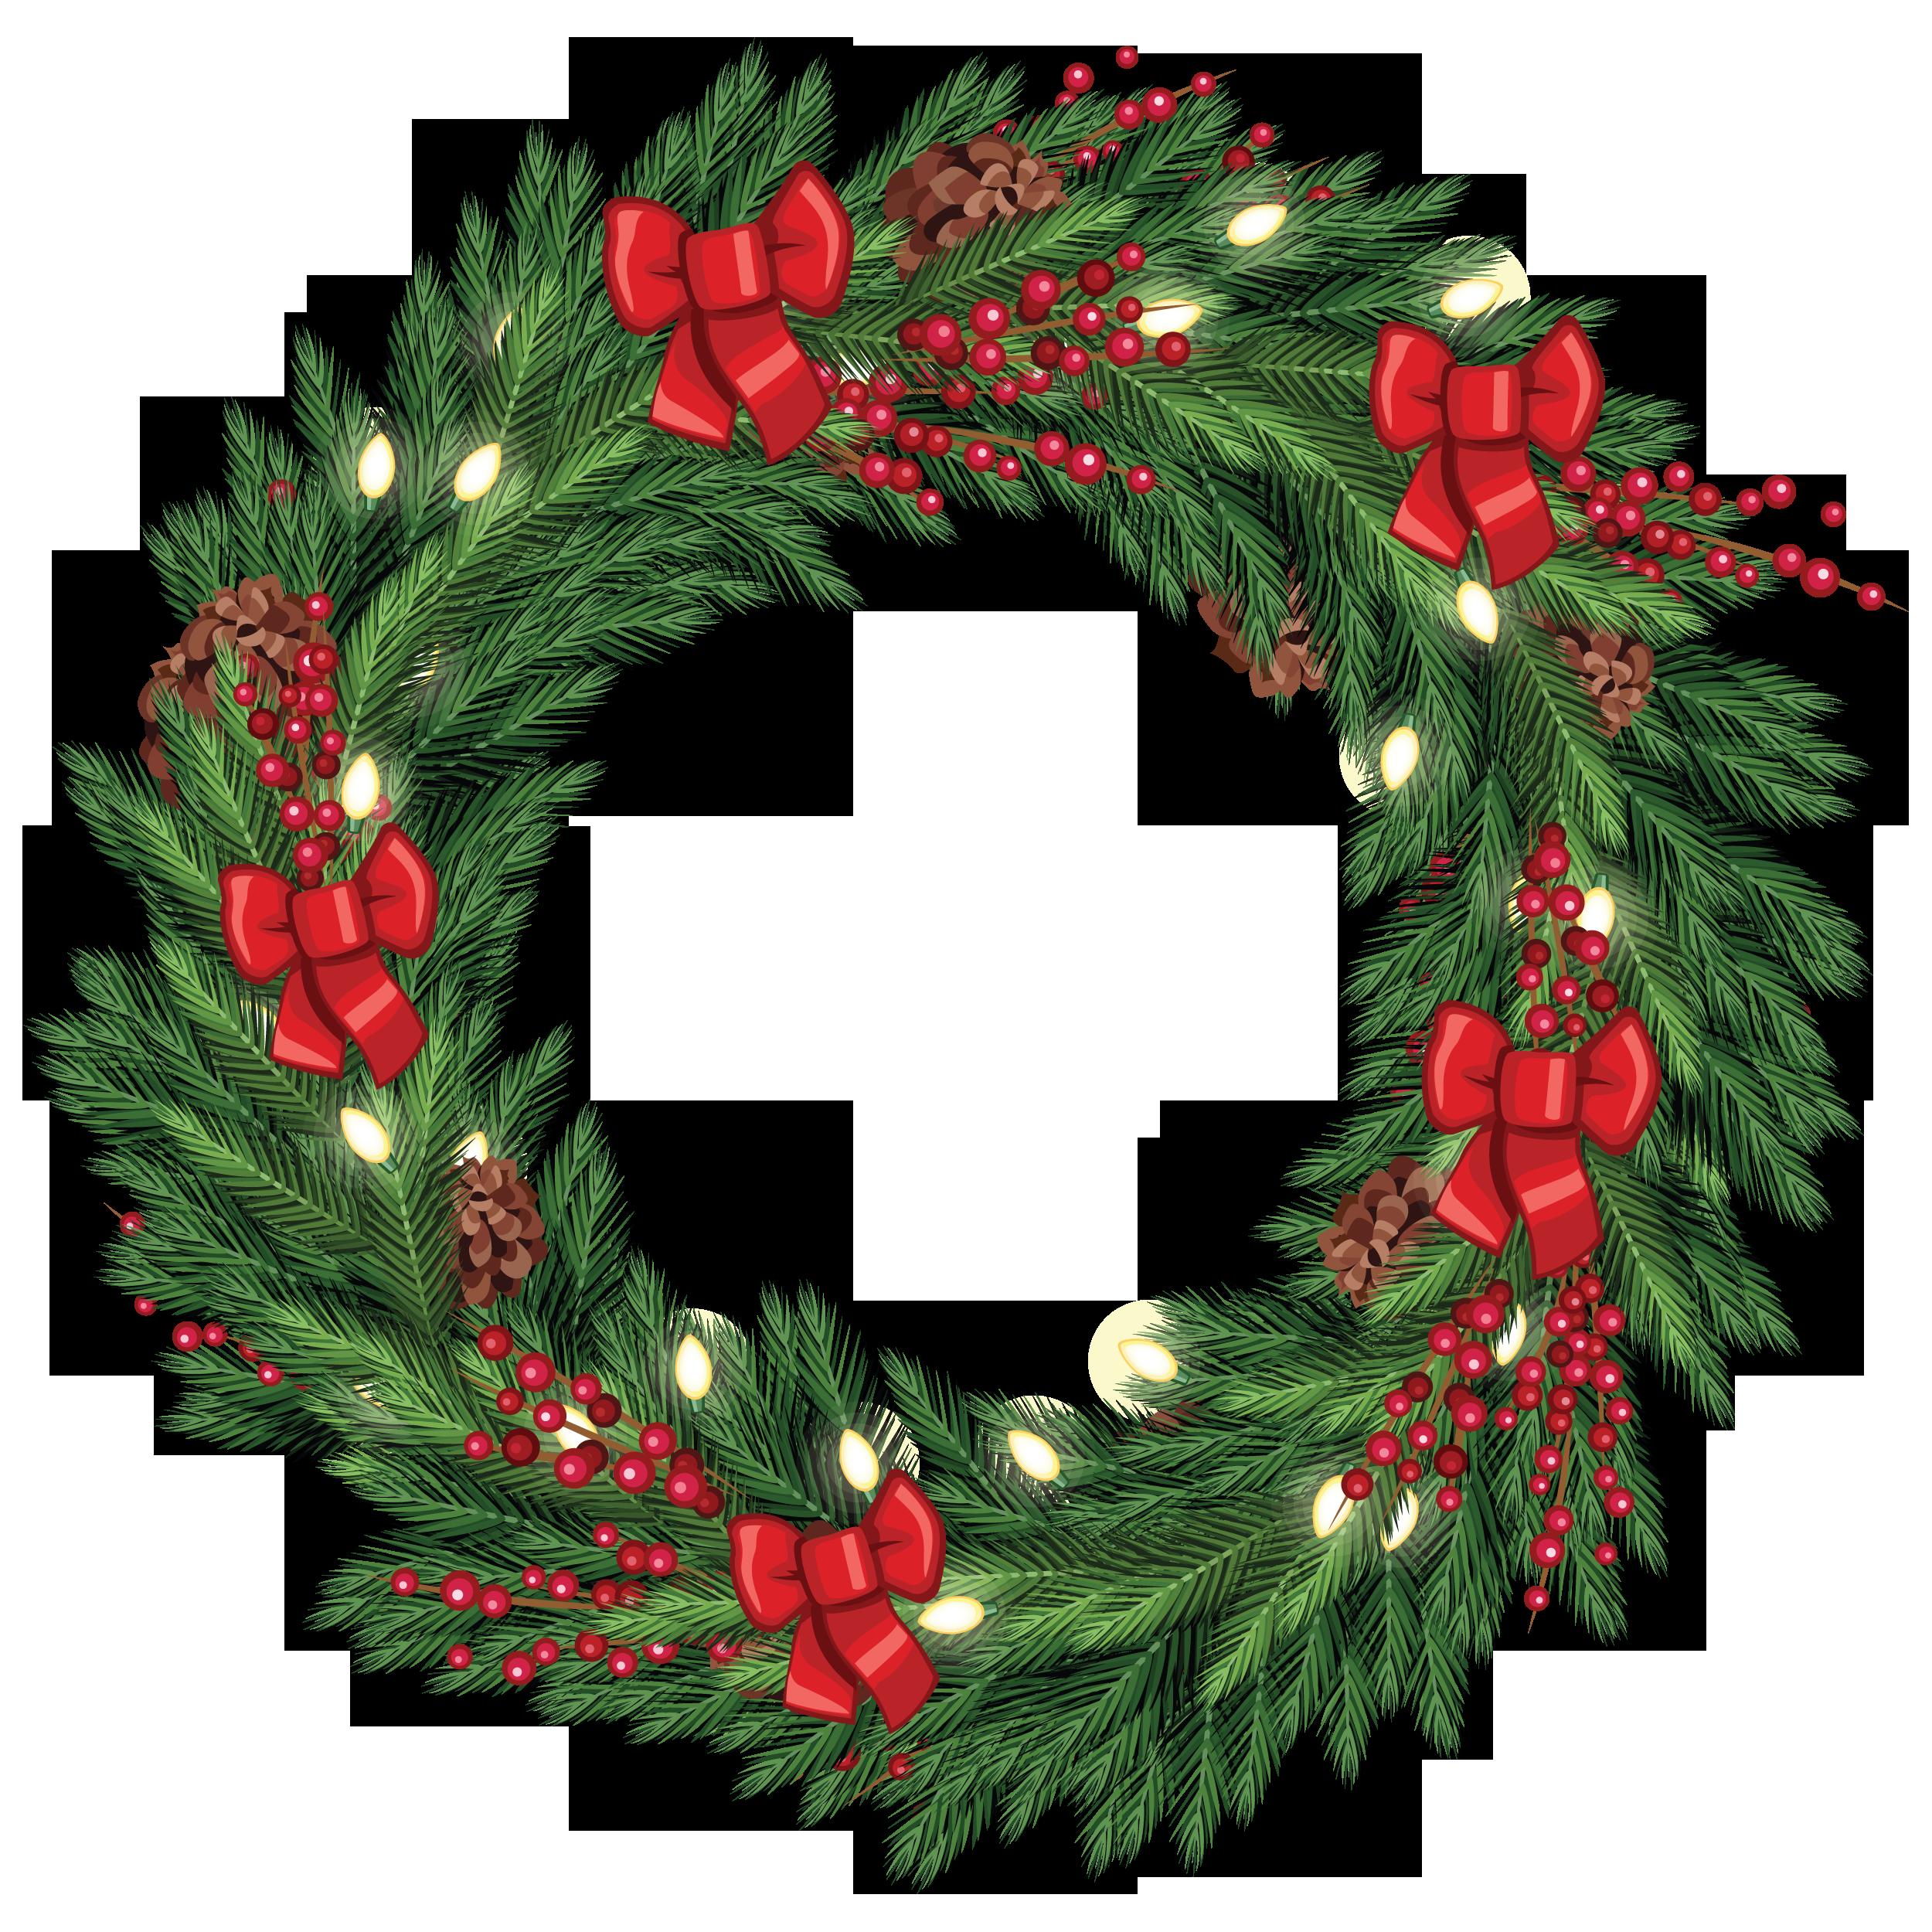 Free Christmas Wreath Graphic from TradigitalArt.